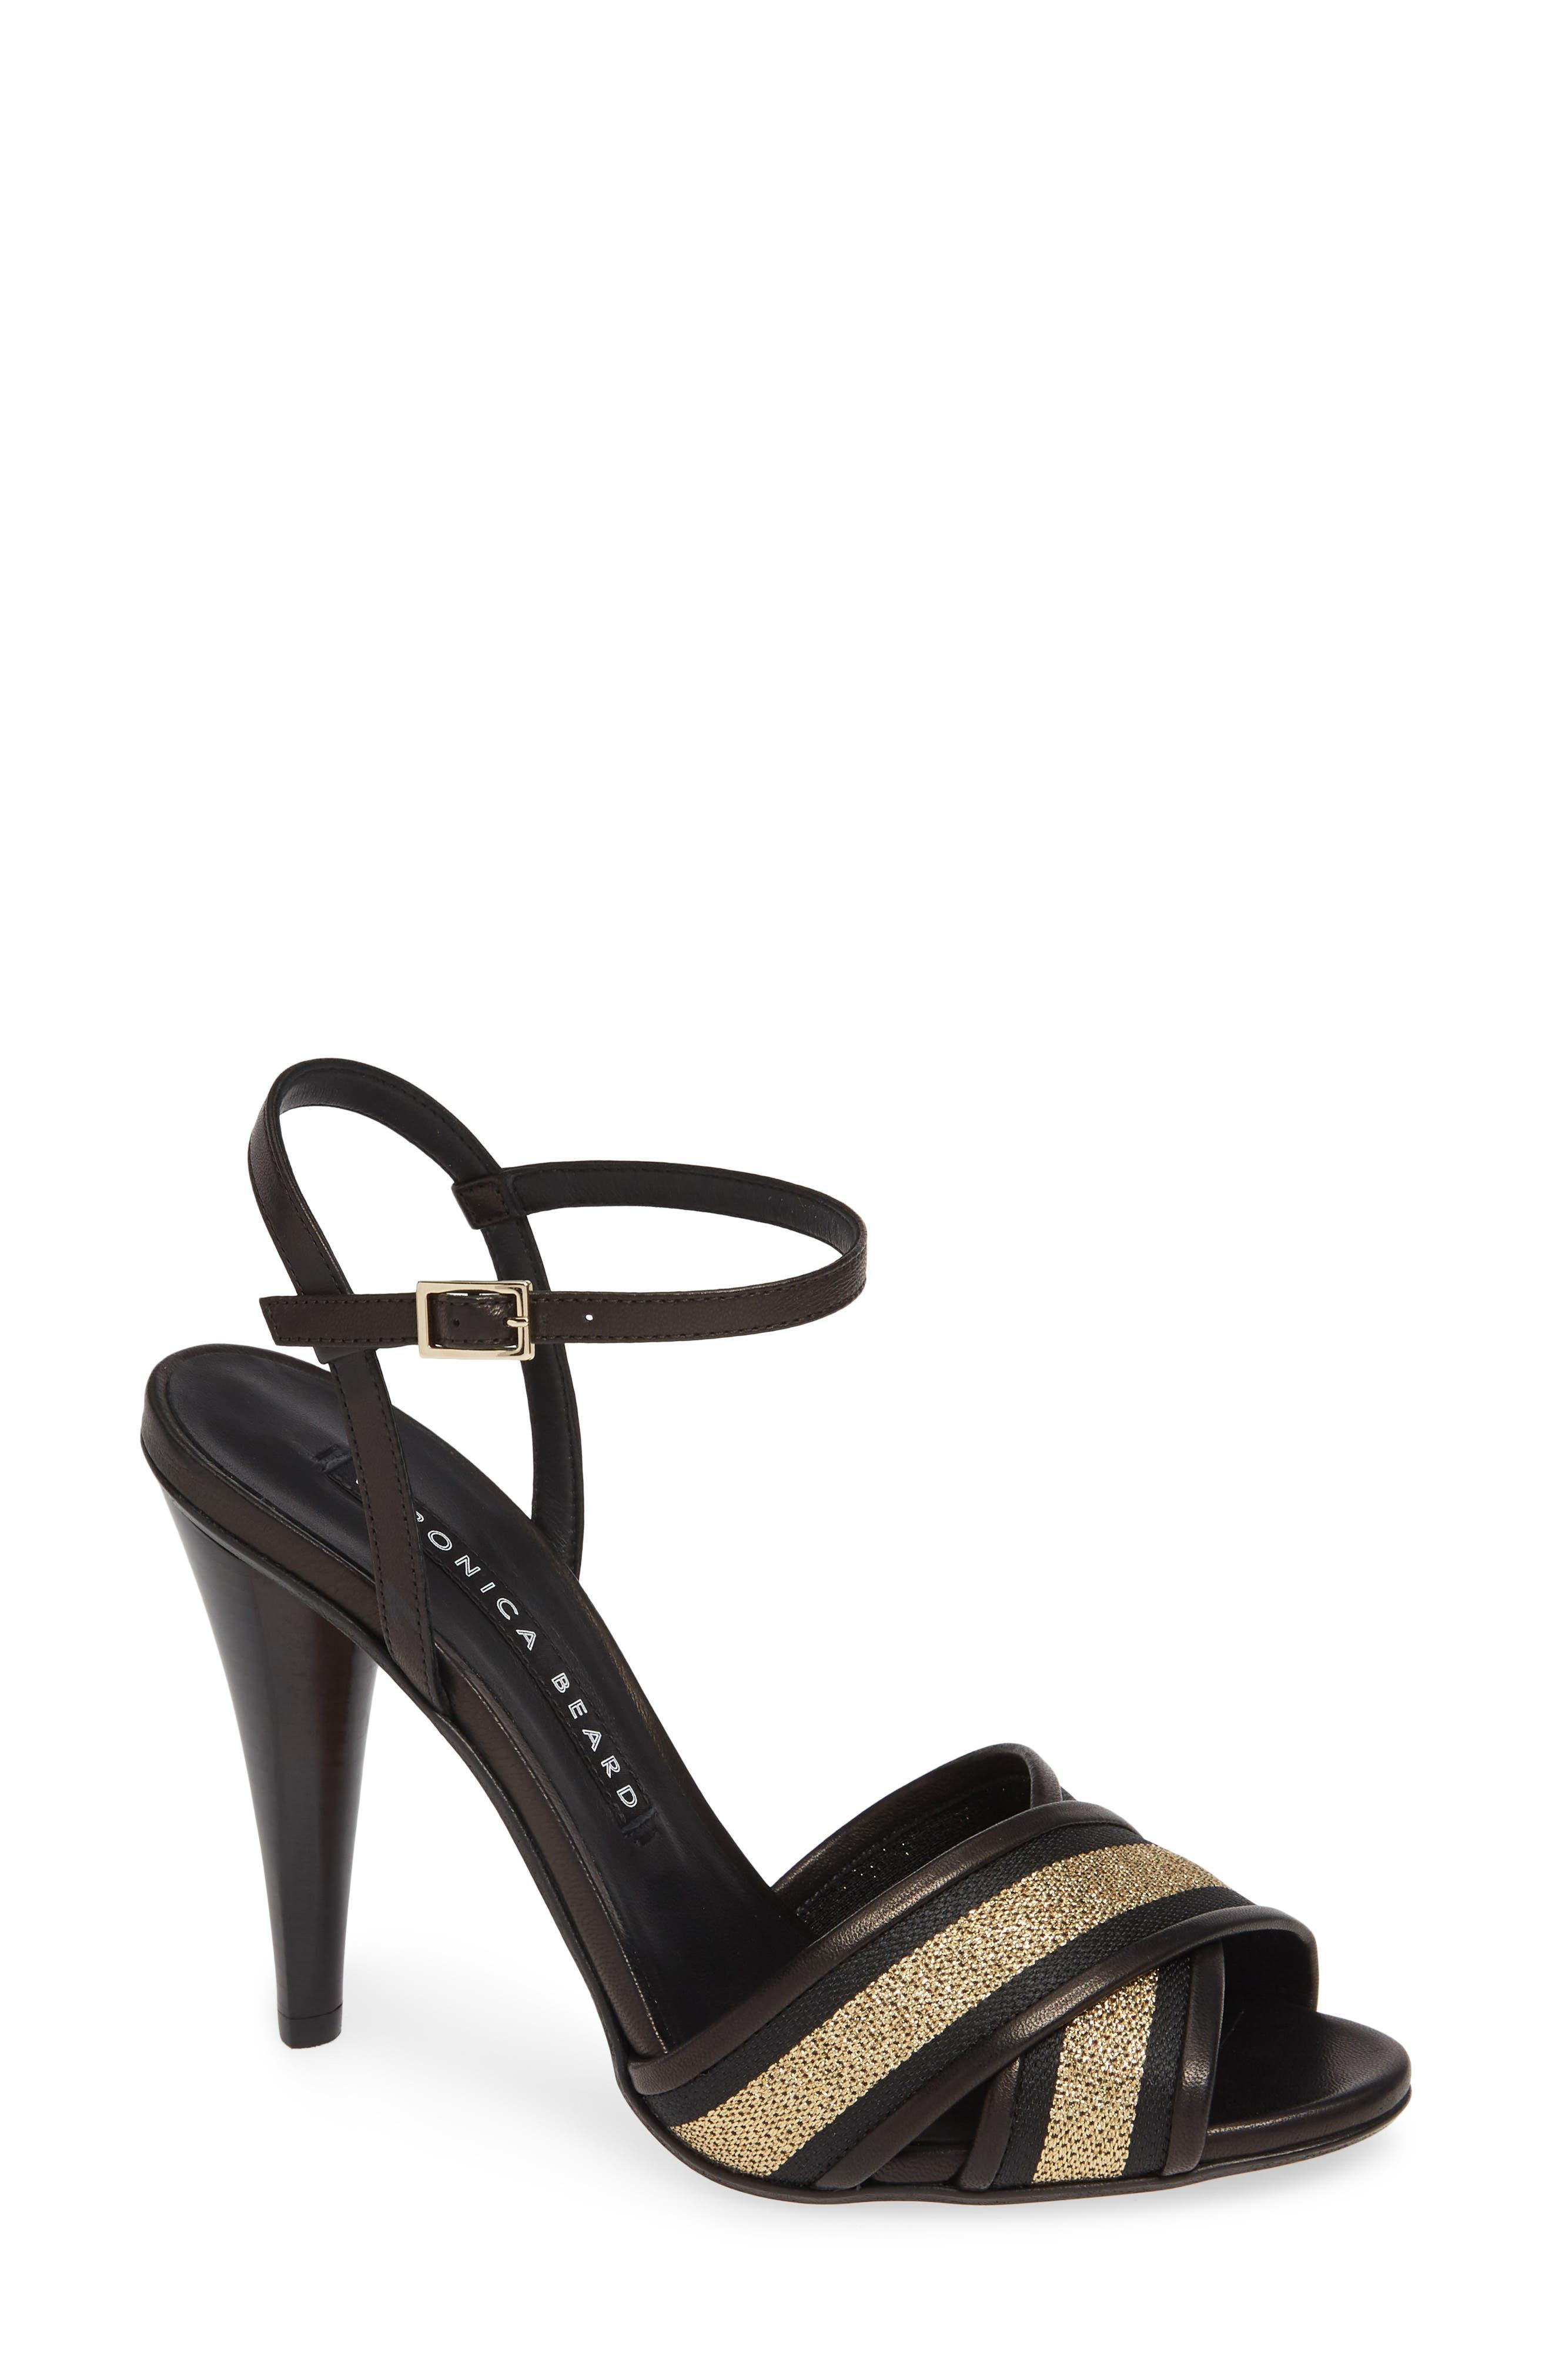 VERONICA BEARD,                             Olympia Quarter Strap Sandal,                             Main thumbnail 1, color,                             BLACK/ GOLD